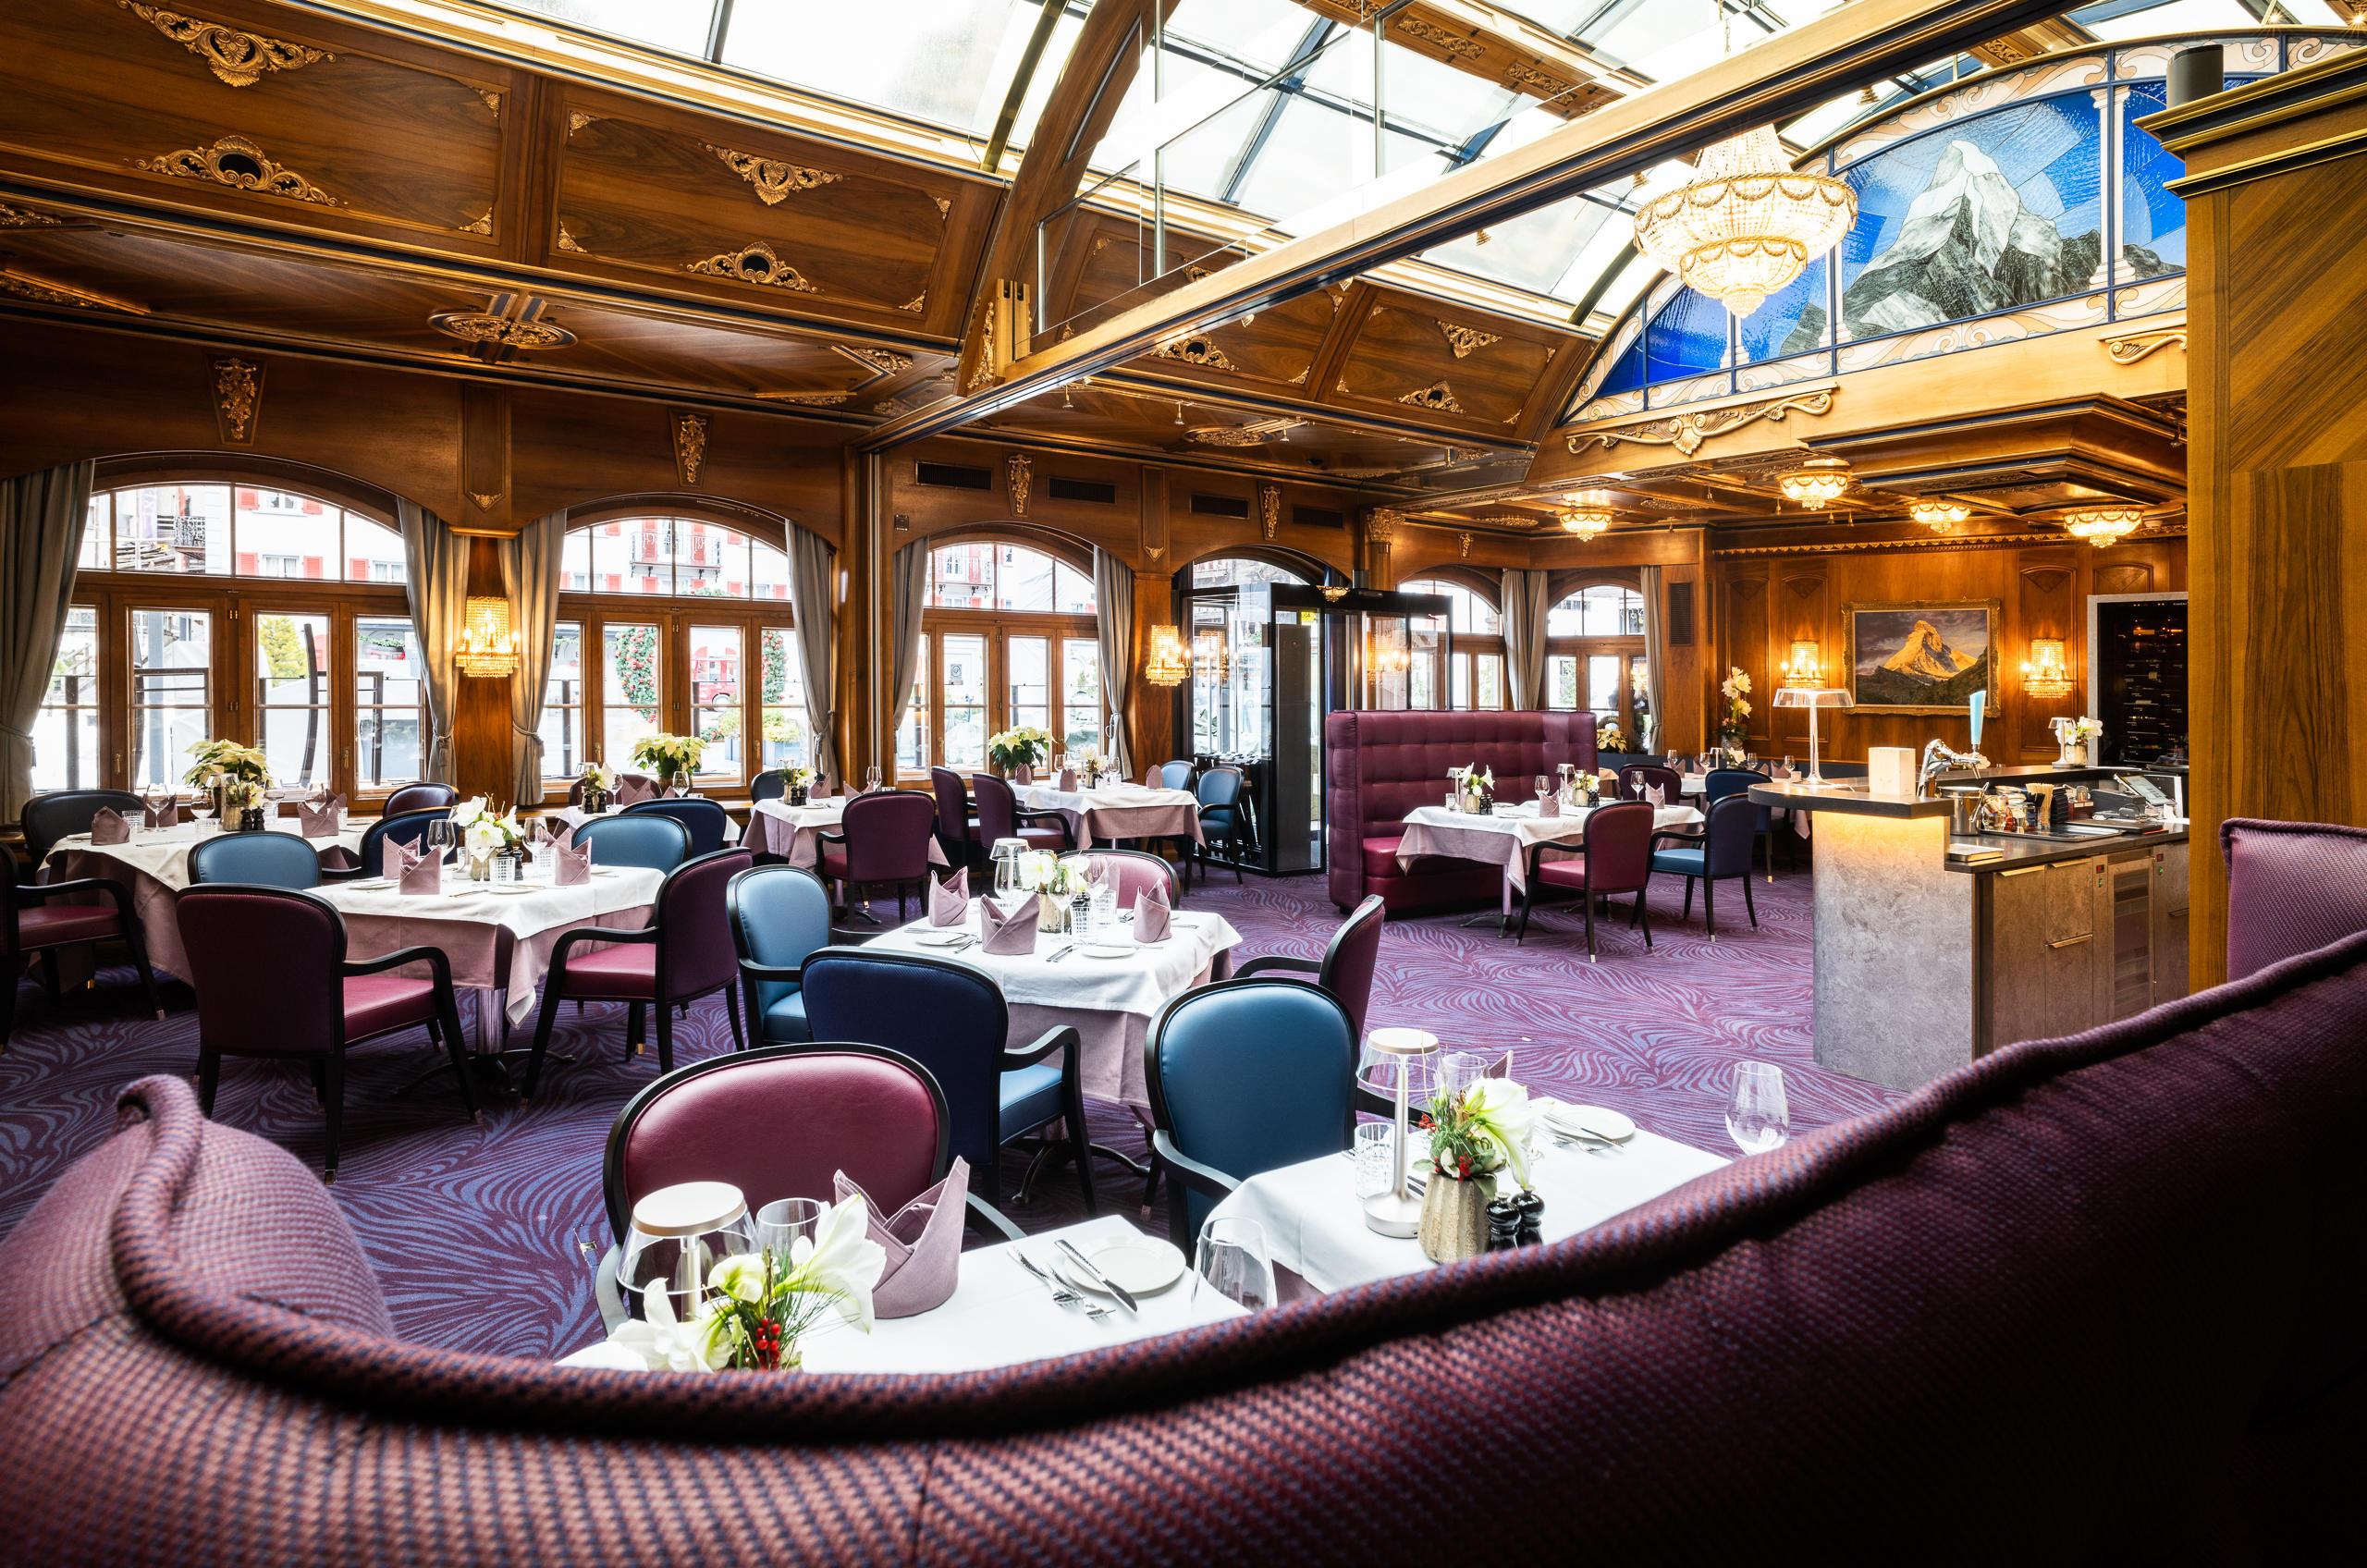 Grand Hotel Zermatterhof - Brasserie Lusi Lounge